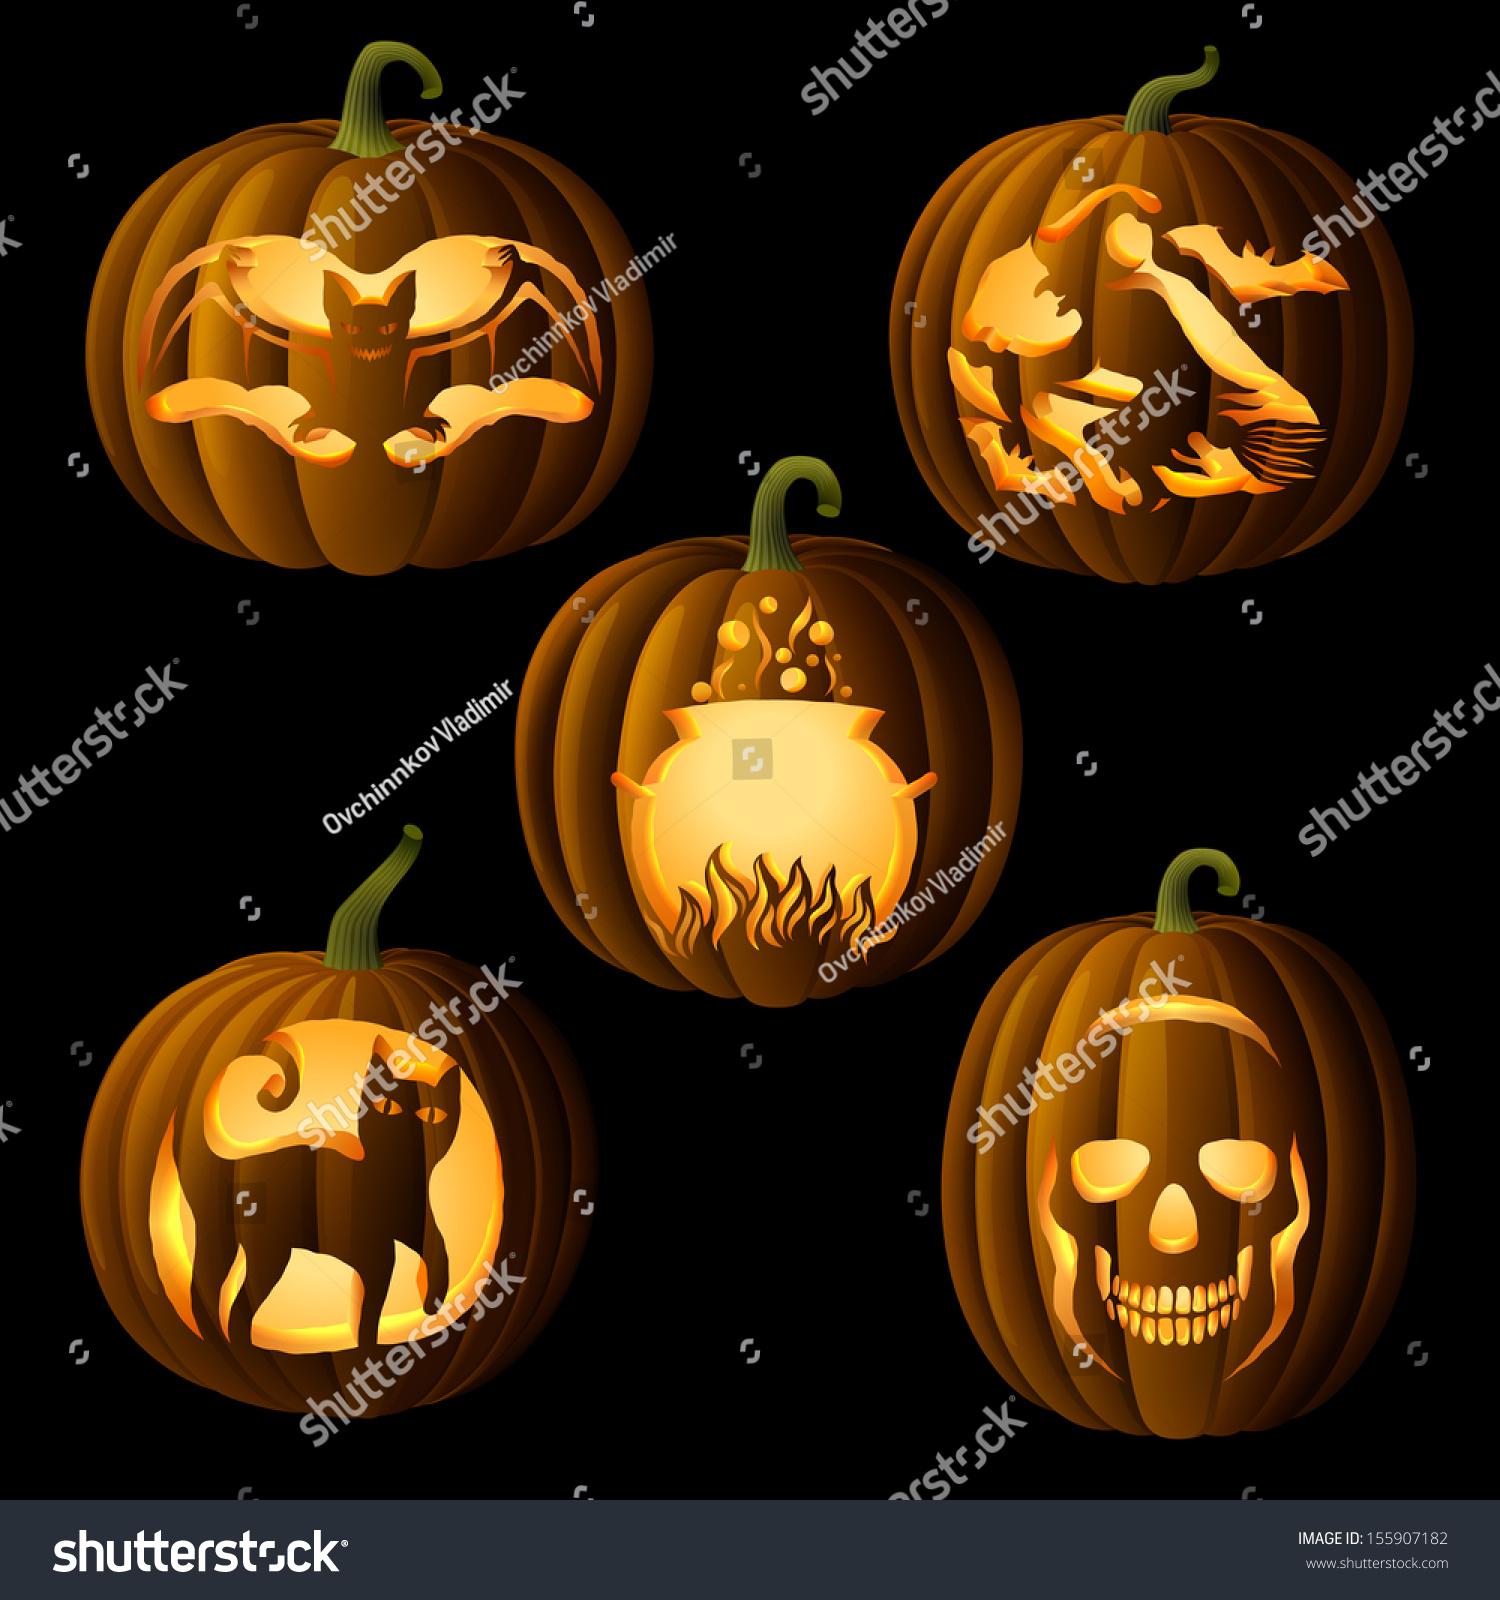 Uncategorized Original Jack O Lantern set original jack o lanterns halloween stock vector 155907182 of with symbols cut on pumpkin detailed illustration